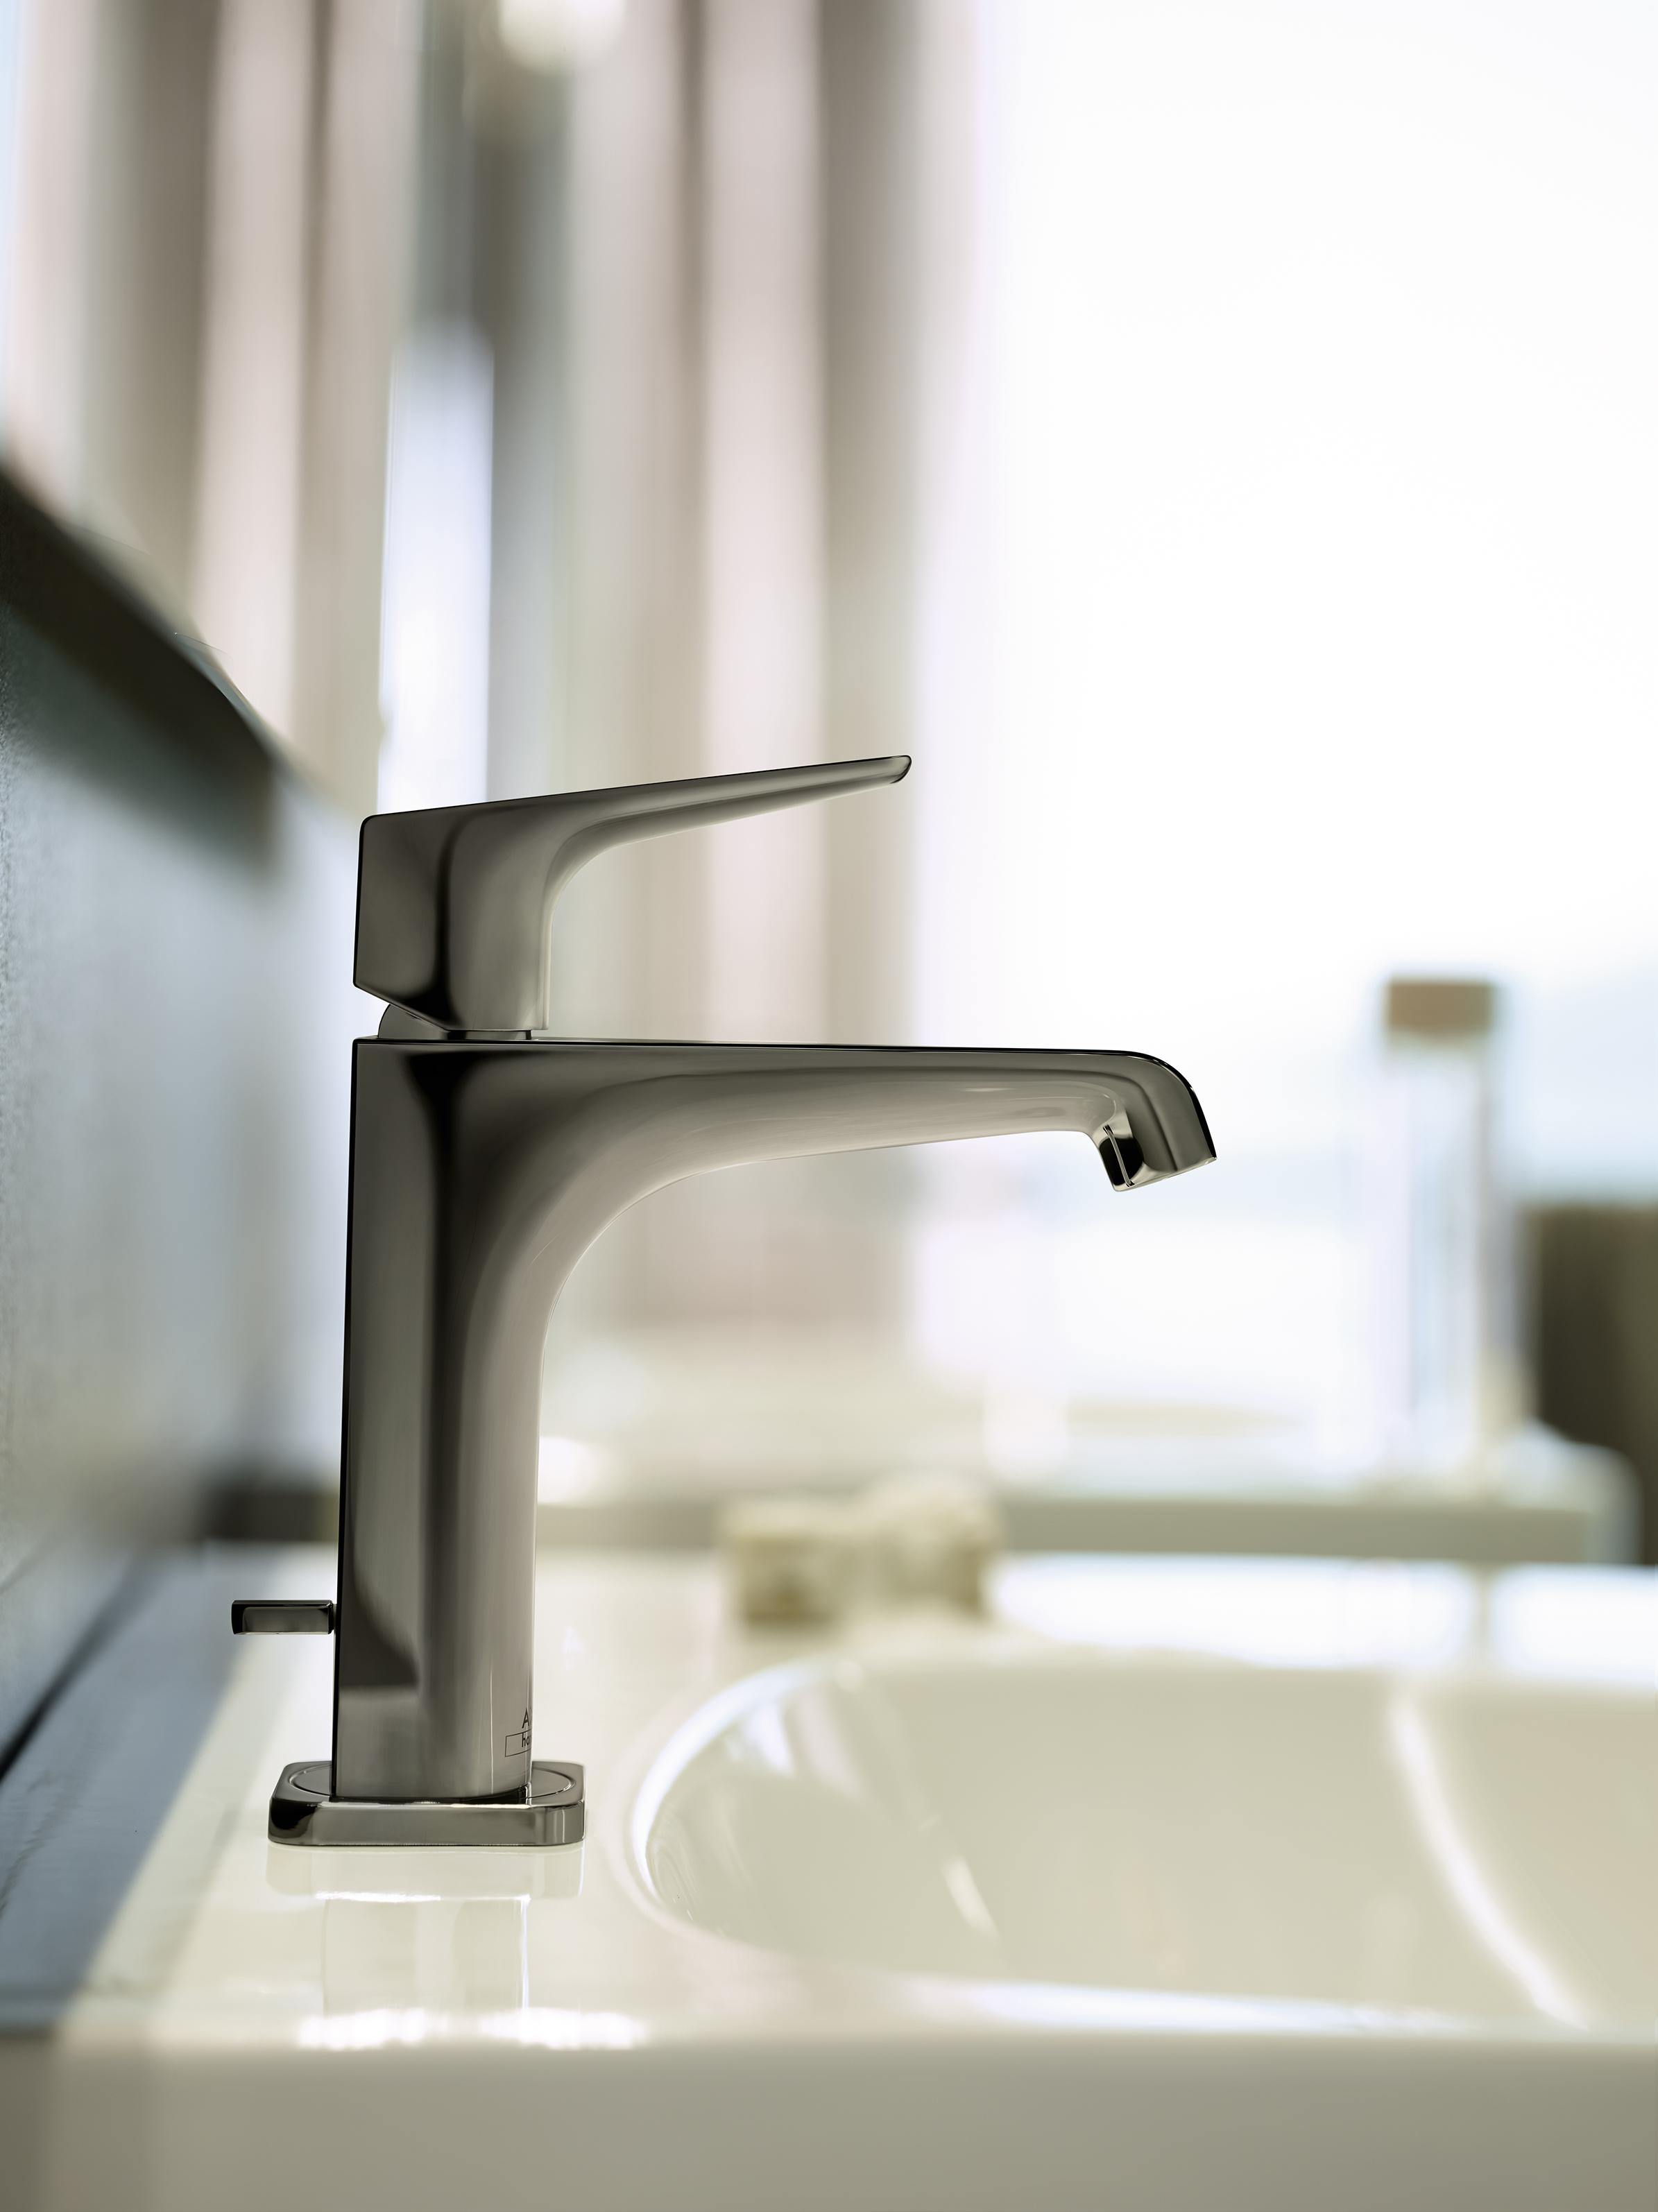 AXOR_Citterio-E-Washbasin-Mixer-Black-Chrome copy.jpg